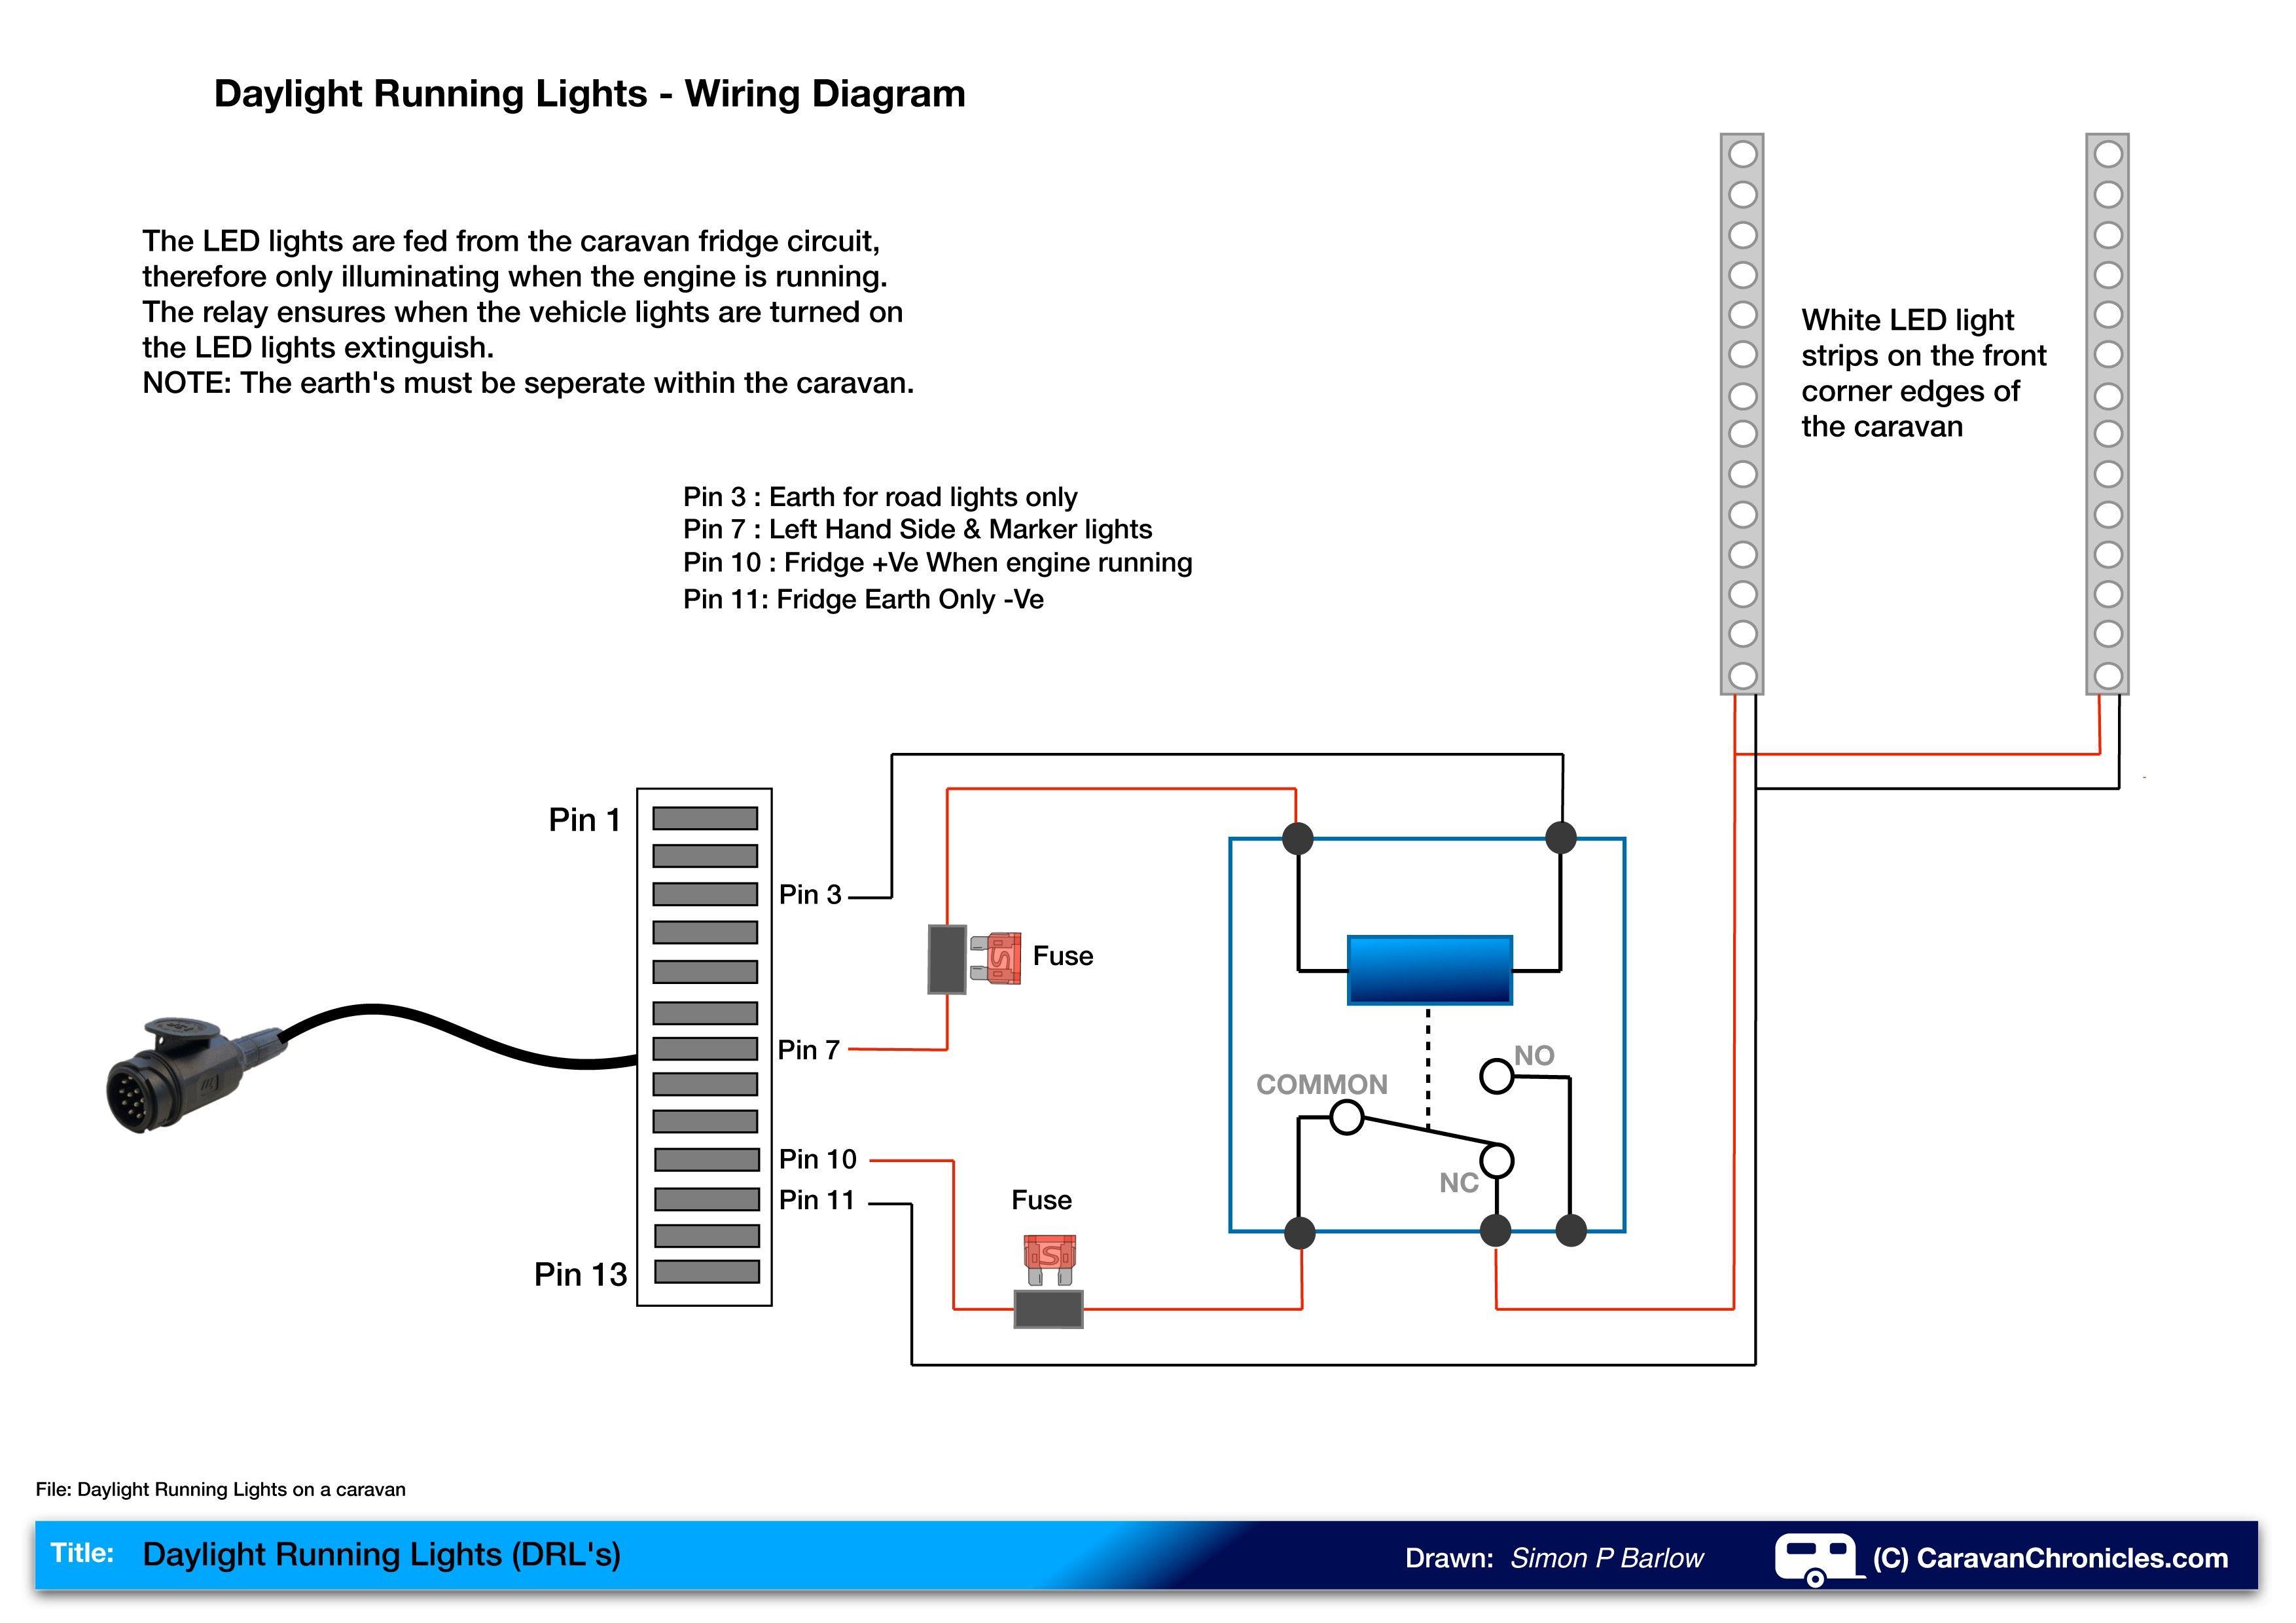 New Trailer Wiring Diagram Running Lights Diagram Diagramsample Diagramtemplate Wiringdiagram Diagramchart Workshe Caravan Diagram Trailer Wiring Diagram